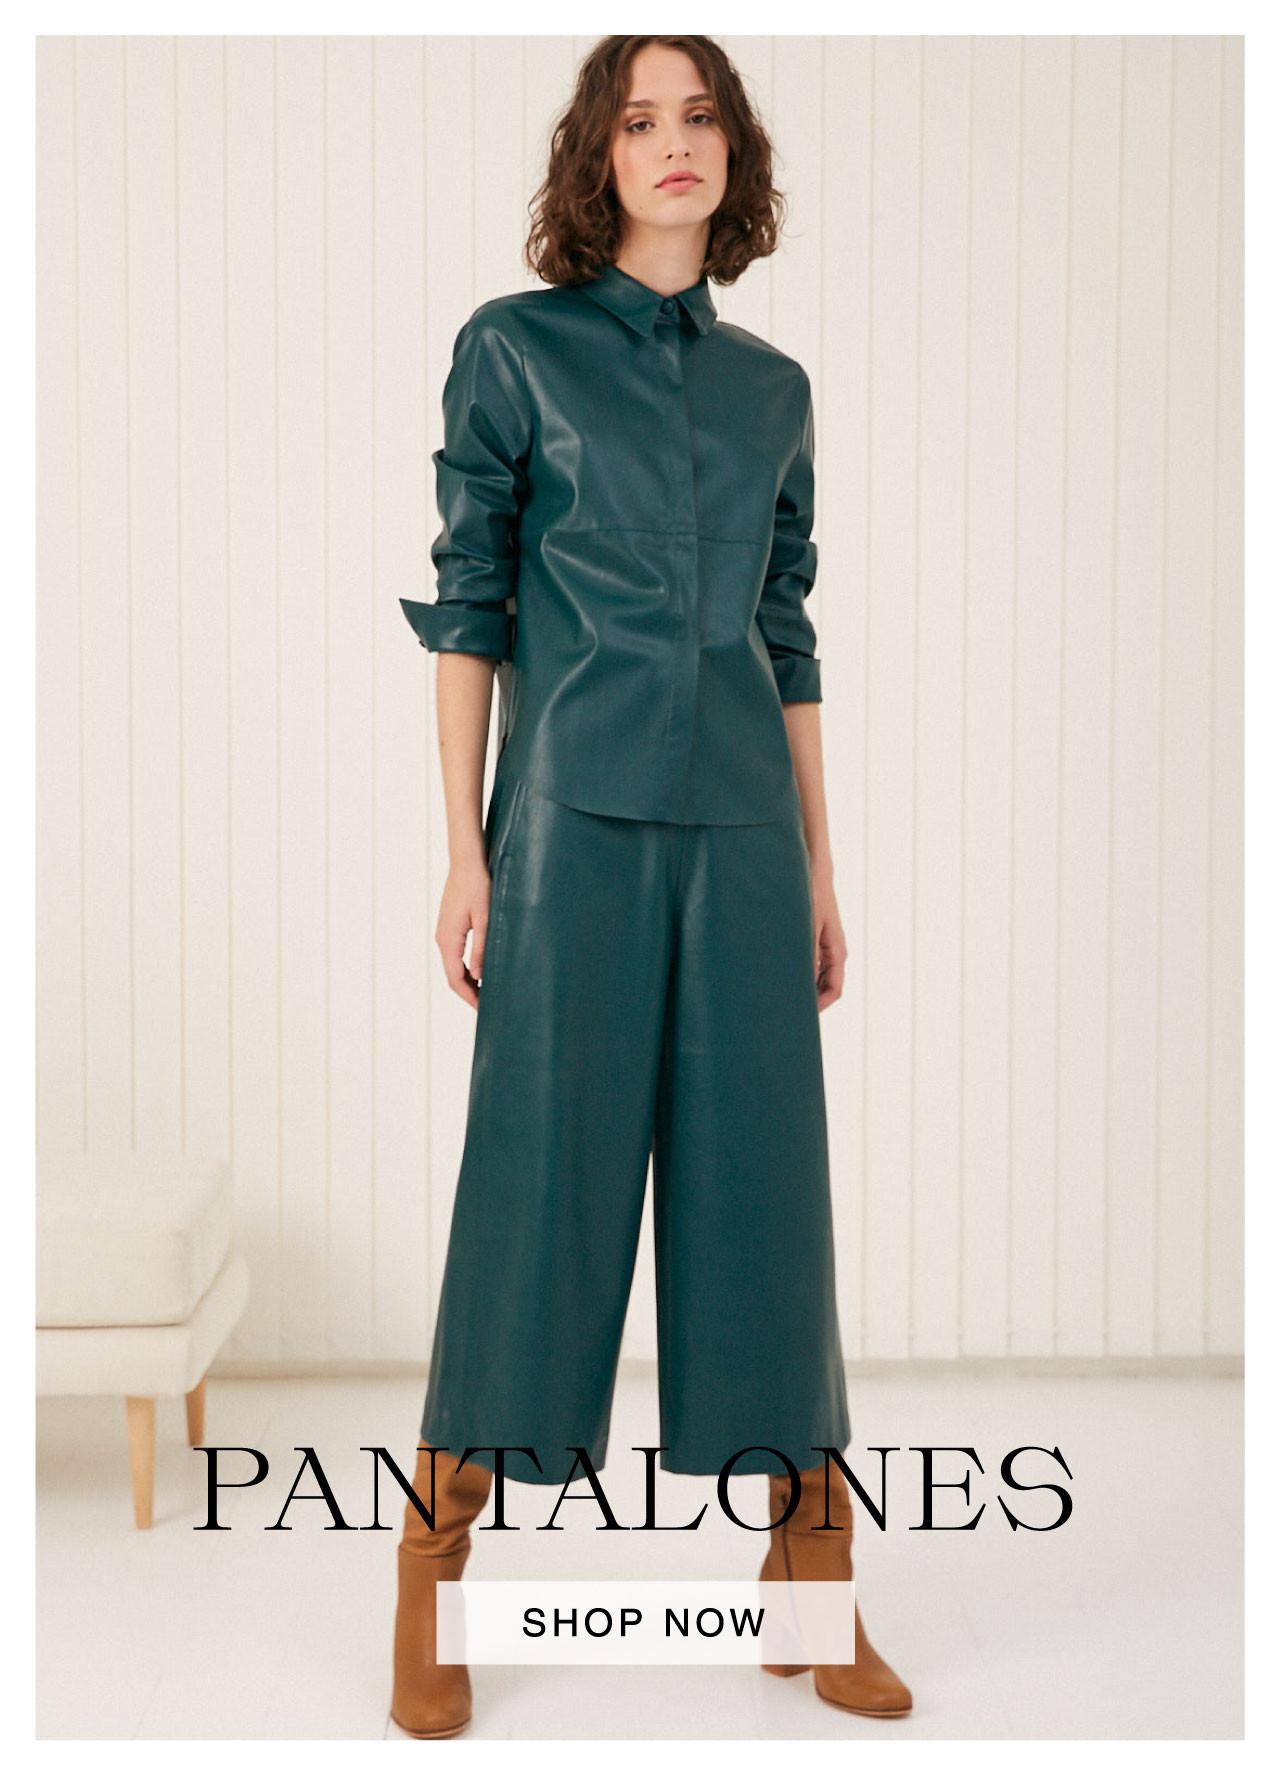 Pantalones - Home Desktop